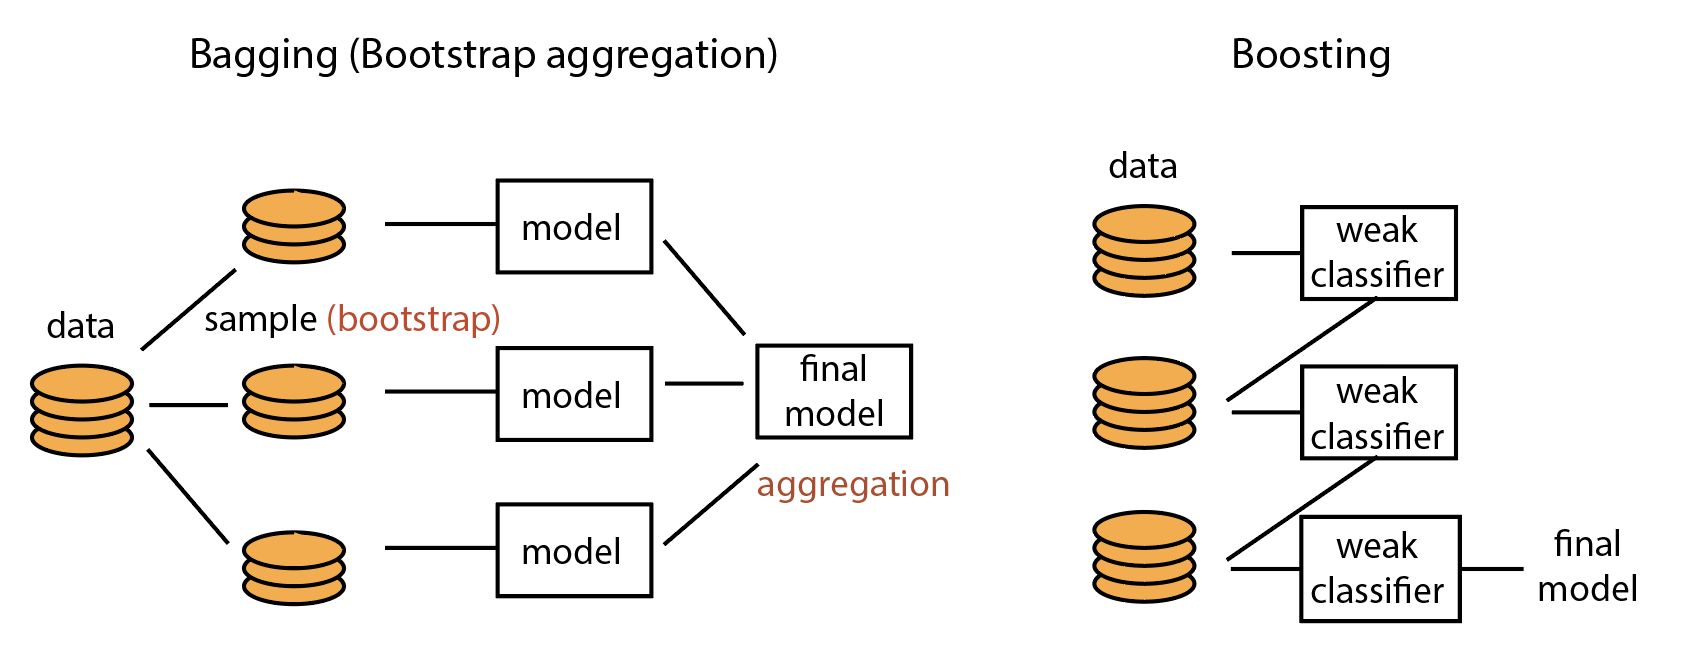 [ML] Bagging หรือ Boosting คืออะไร ทำงานอย่างไร?